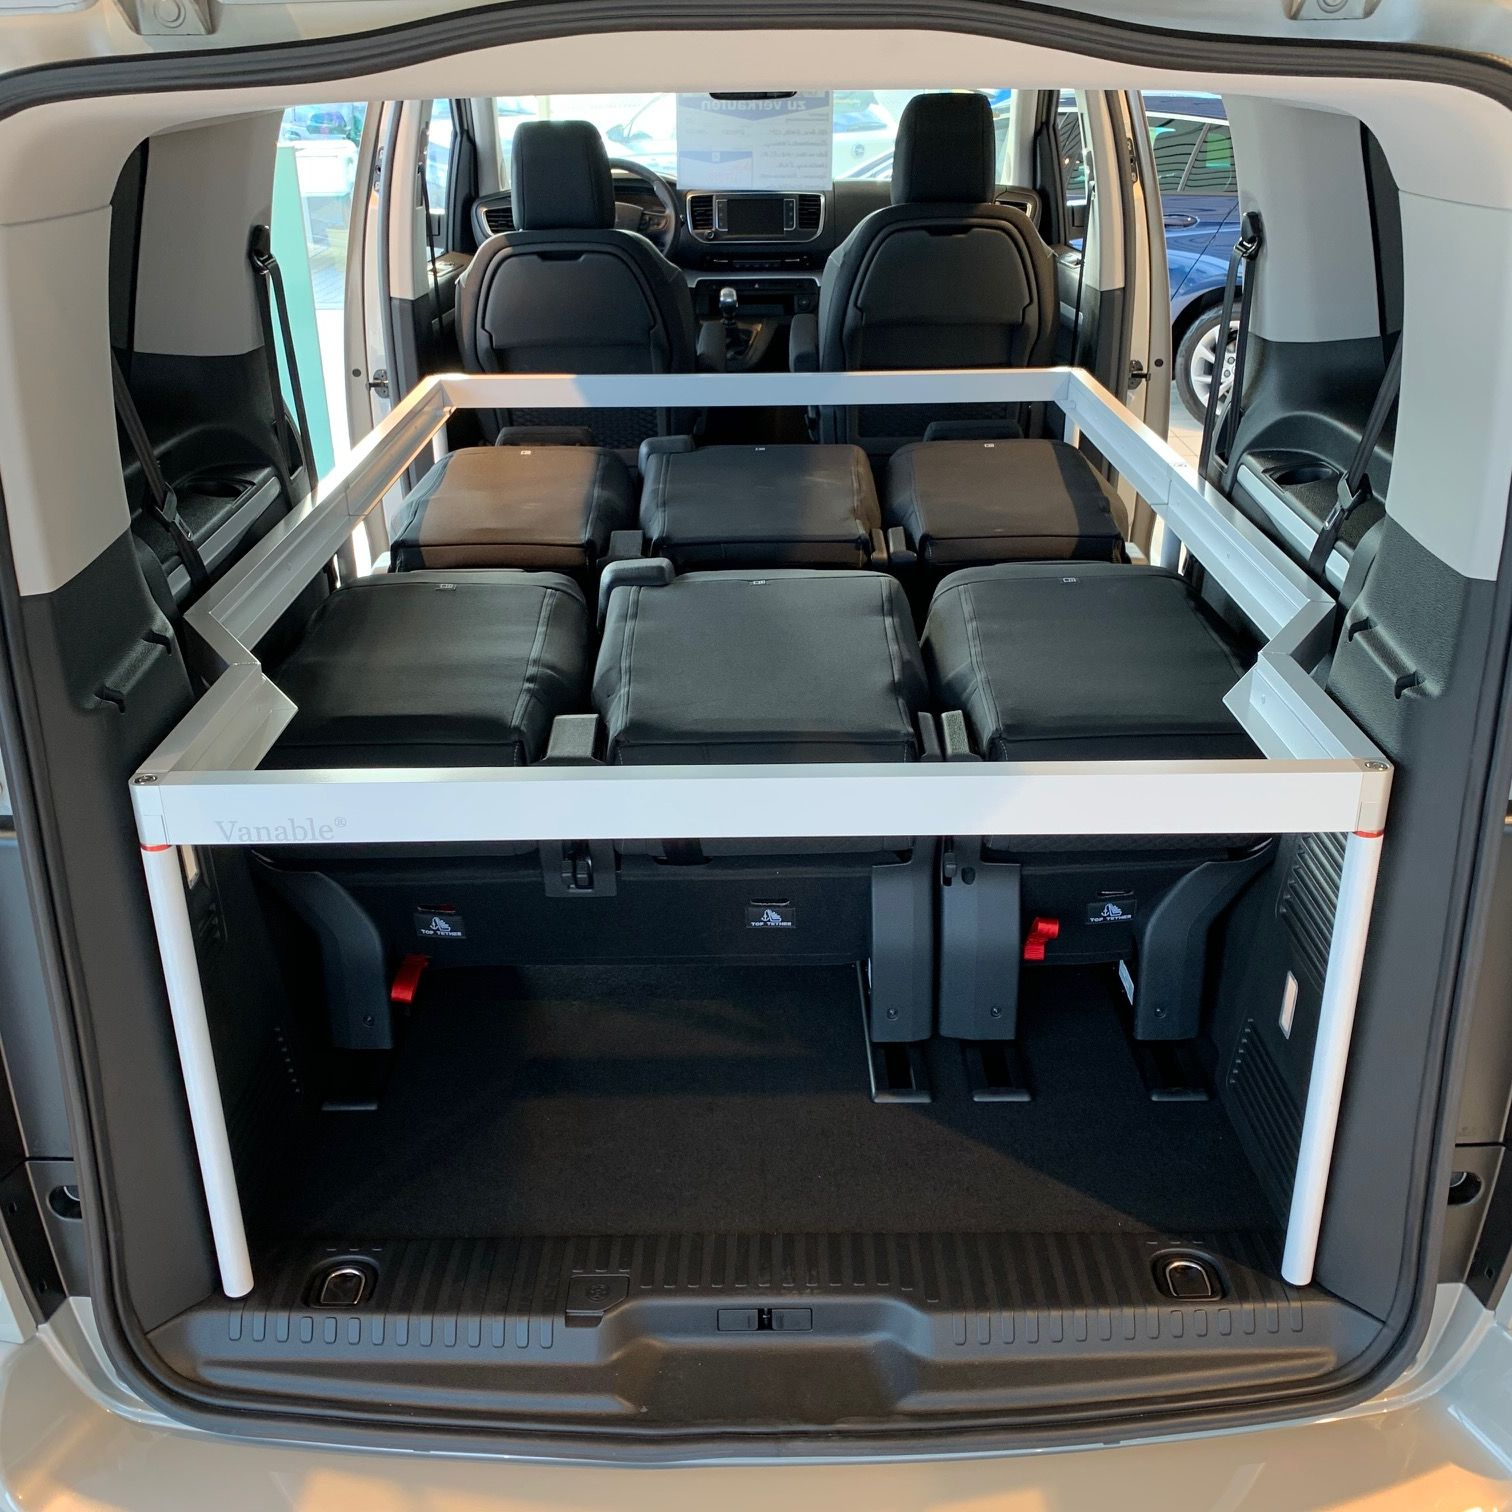 Opel Zafira Life M L2 Vanable Macht Jeden Van Zum Wohnmobil In 2020 Wohnmobil Fahrzeuge Kleintransporter